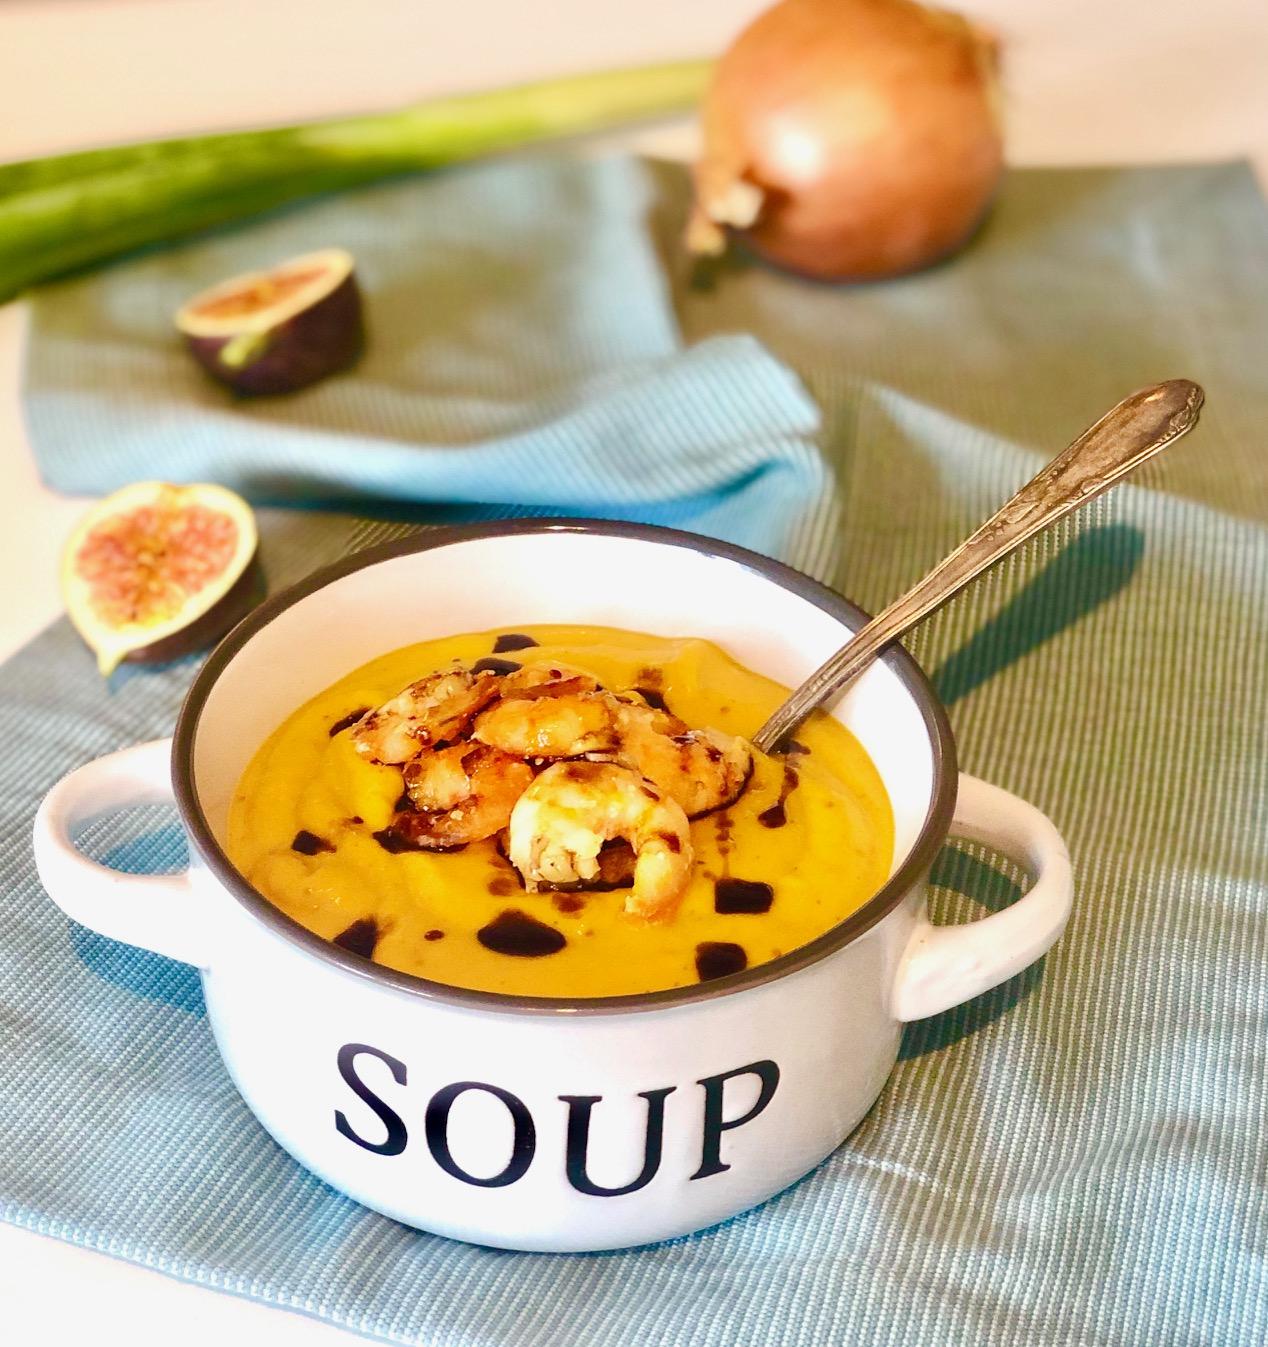 Kürbis Feigen Suppe - Bild zum Rezept